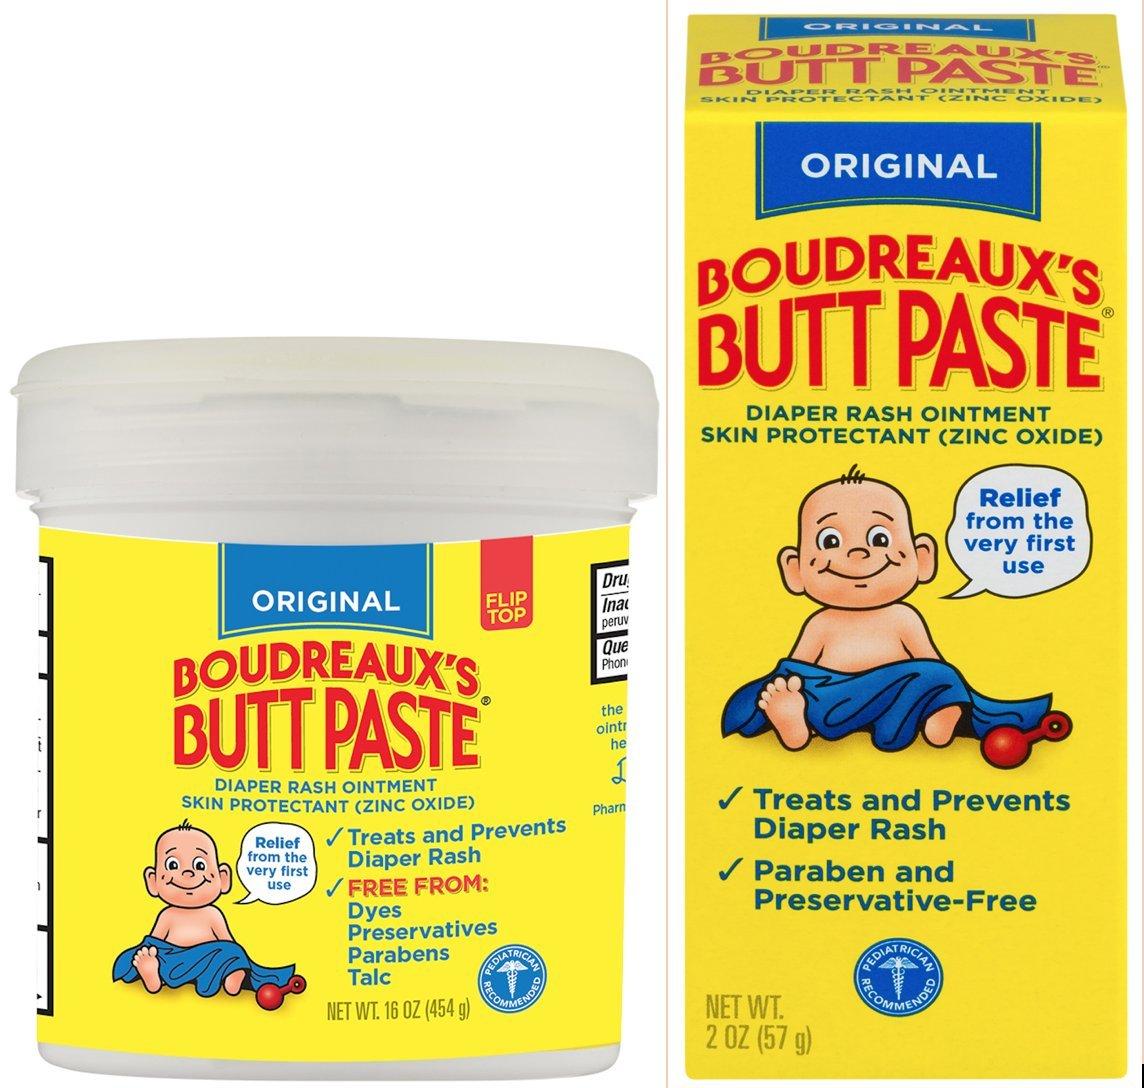 Boudreaux's Butt Paste Diaper Rash Ointment Home and Travel Kit | Original |16 oz. Jar and 2 oz. Tube | Paraben & Preservative Free